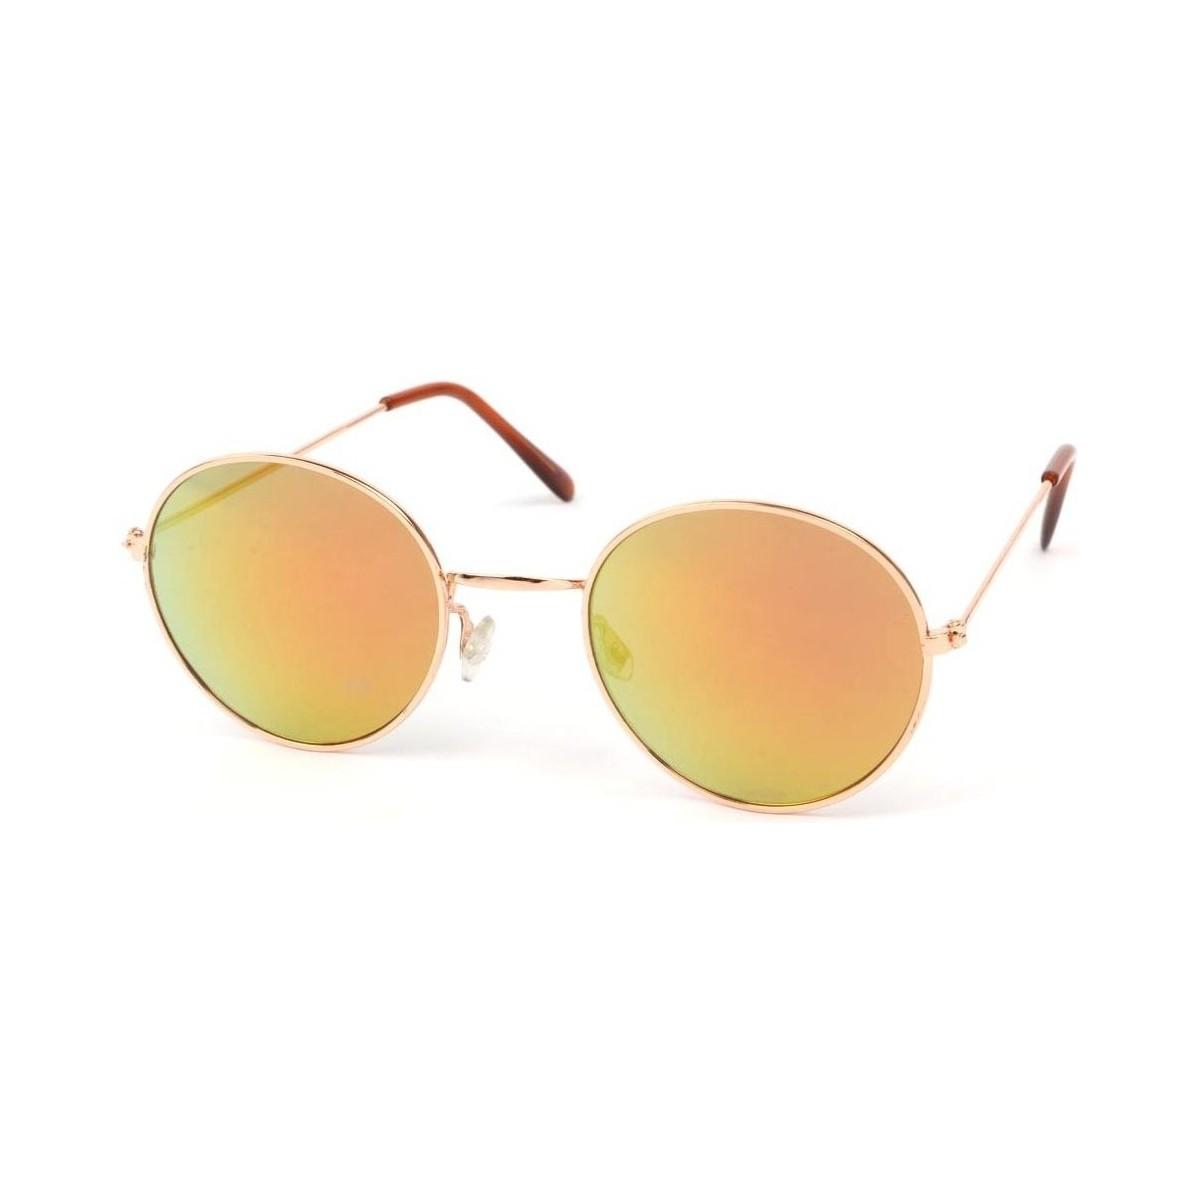 Eye Wear Lunettes Soleil John monture dorée verres reflets dorées Jaune